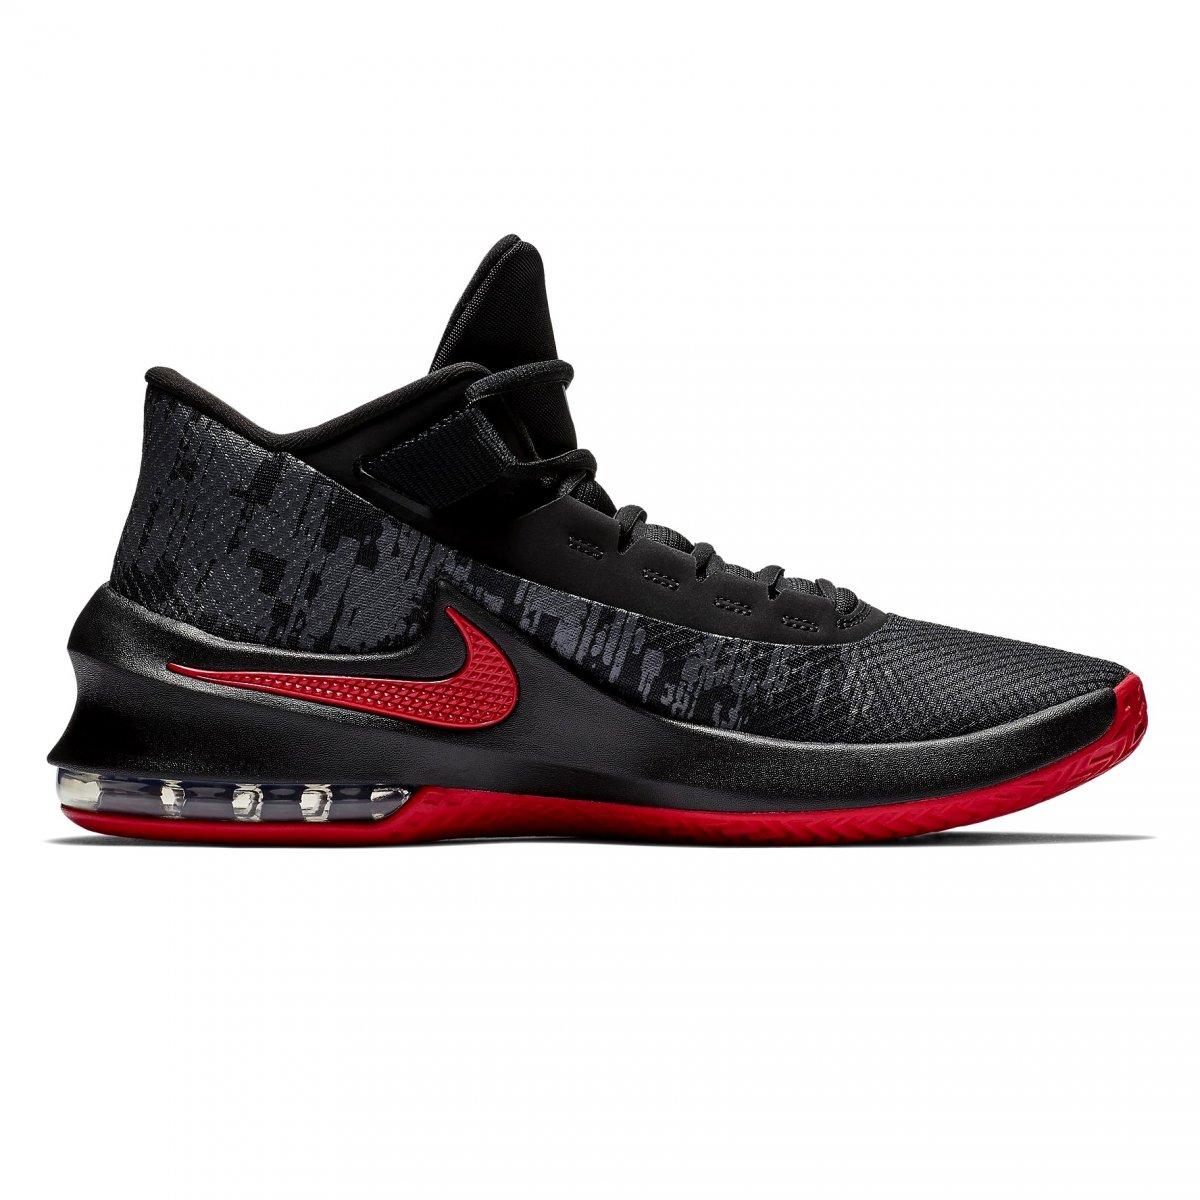 1c302f2284f Amplie a imagem. Tênis de Basquete Masculino Nike Air Max Infuriate 2 Mid   Tênis de Basquete Masculino ...